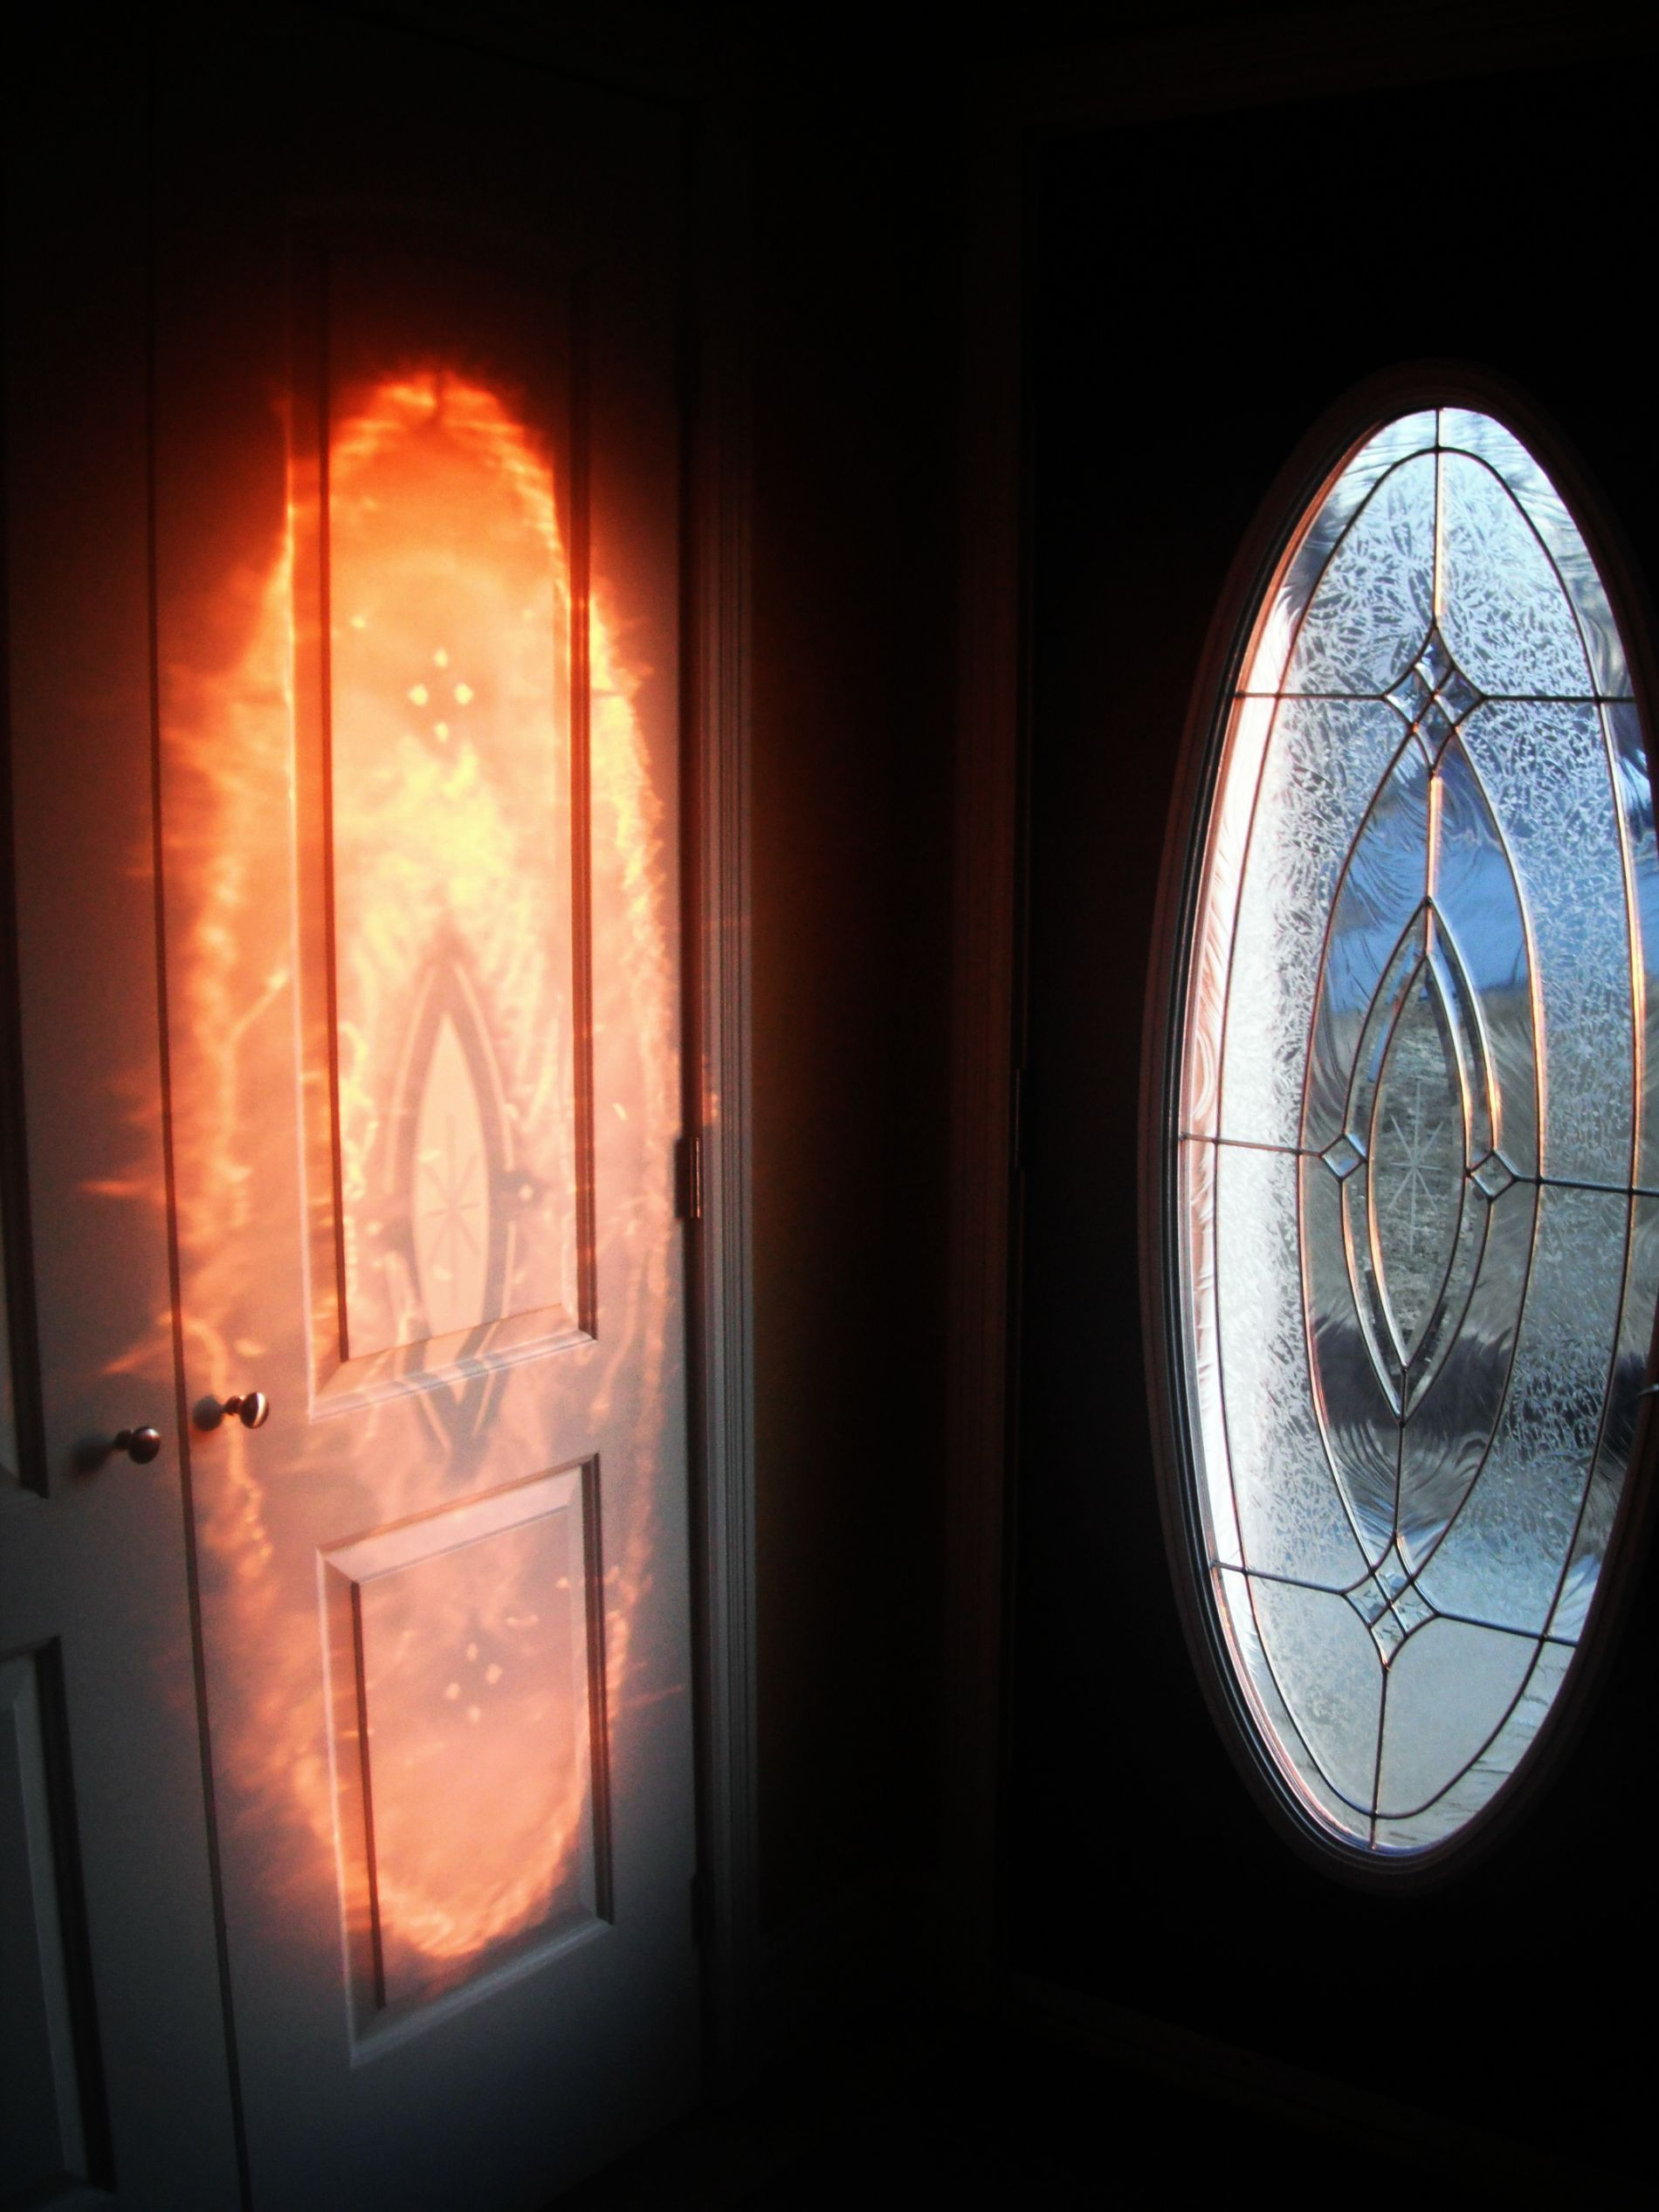 A portal into Mordor.